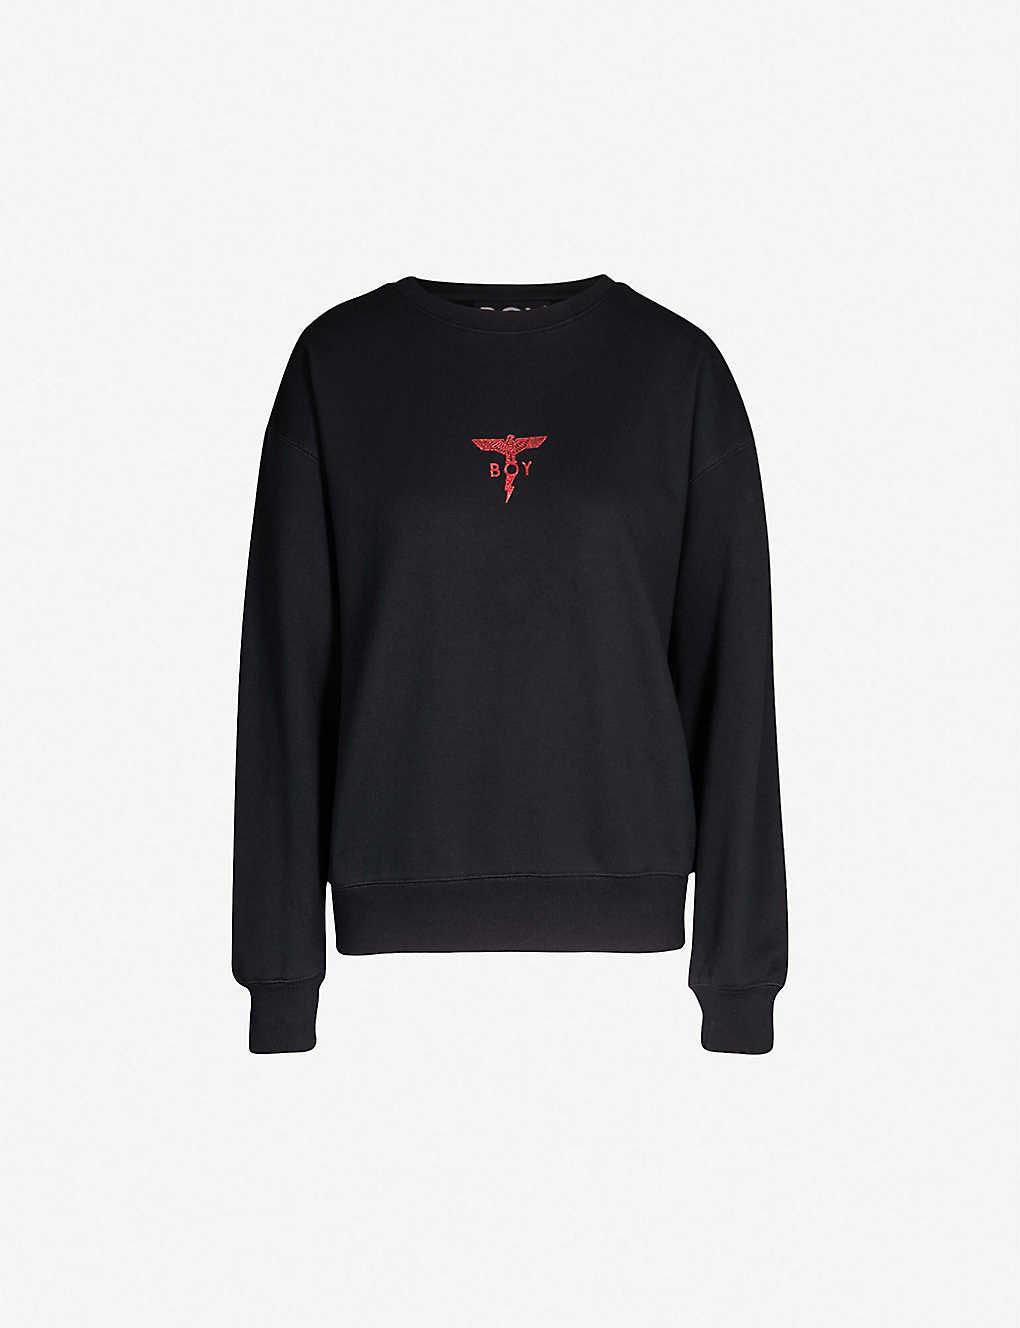 de0bdb065 Lightning logo-print cotton-jersey sweatshirt - Blackred gold ...